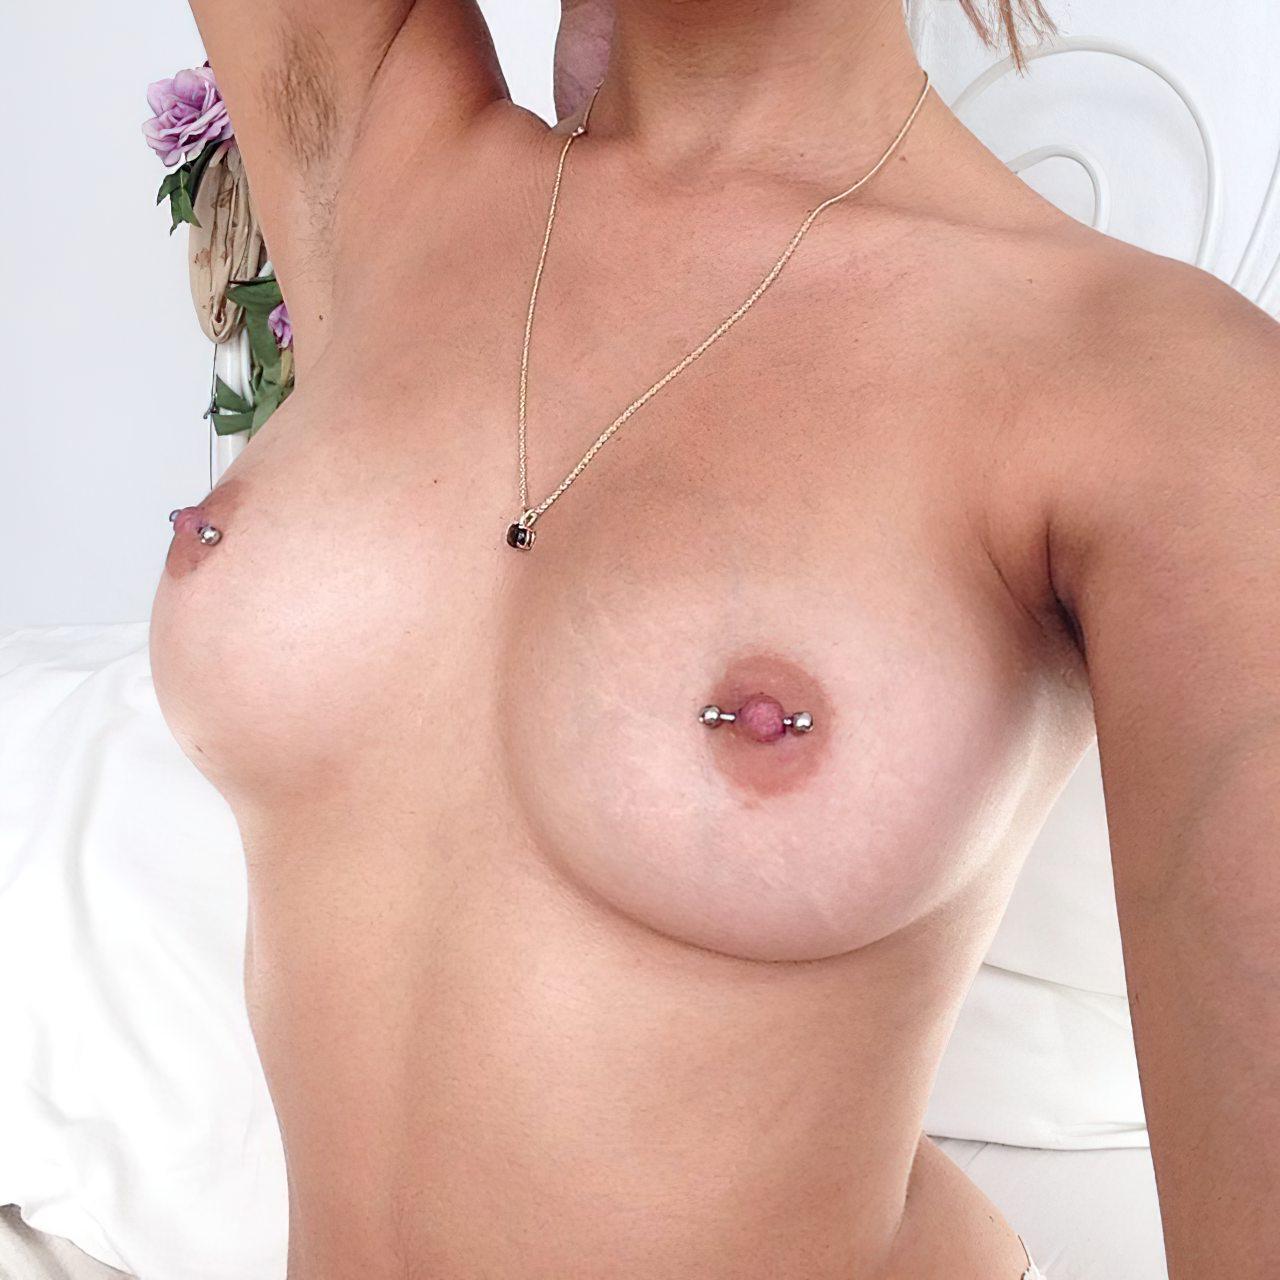 Moças Nuas (44)